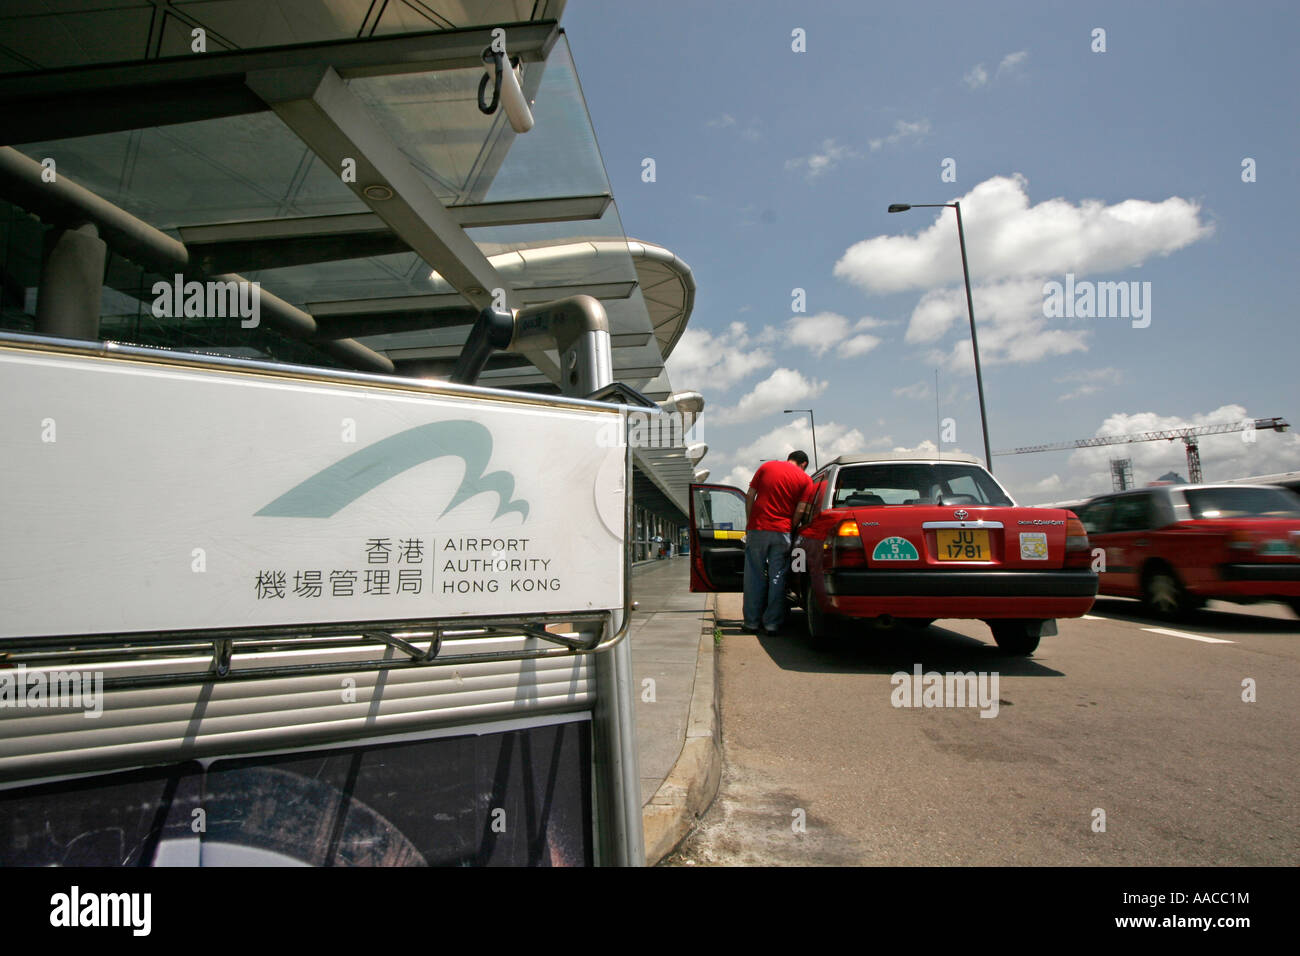 Chek Lap Kok airport Hong Kong - Stock Image